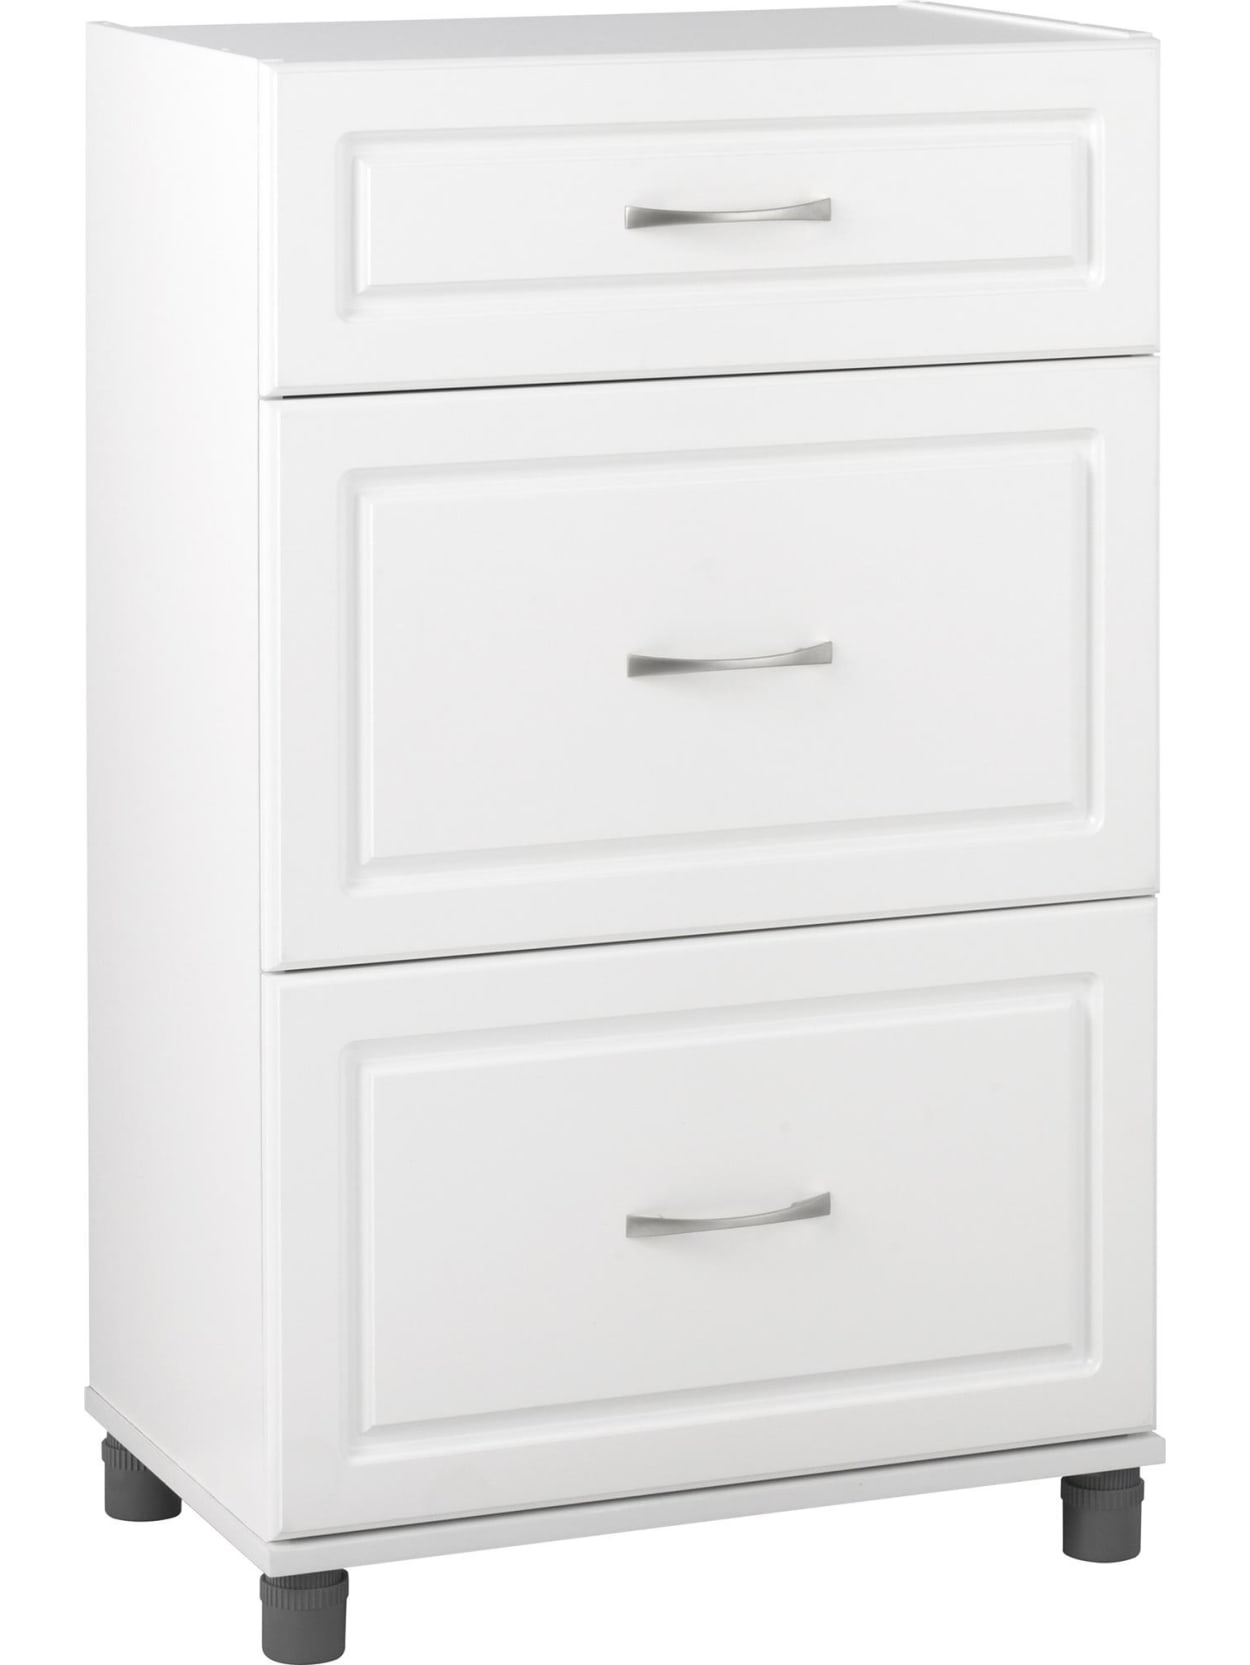 Base Storage Cabinet 3 Drawers White